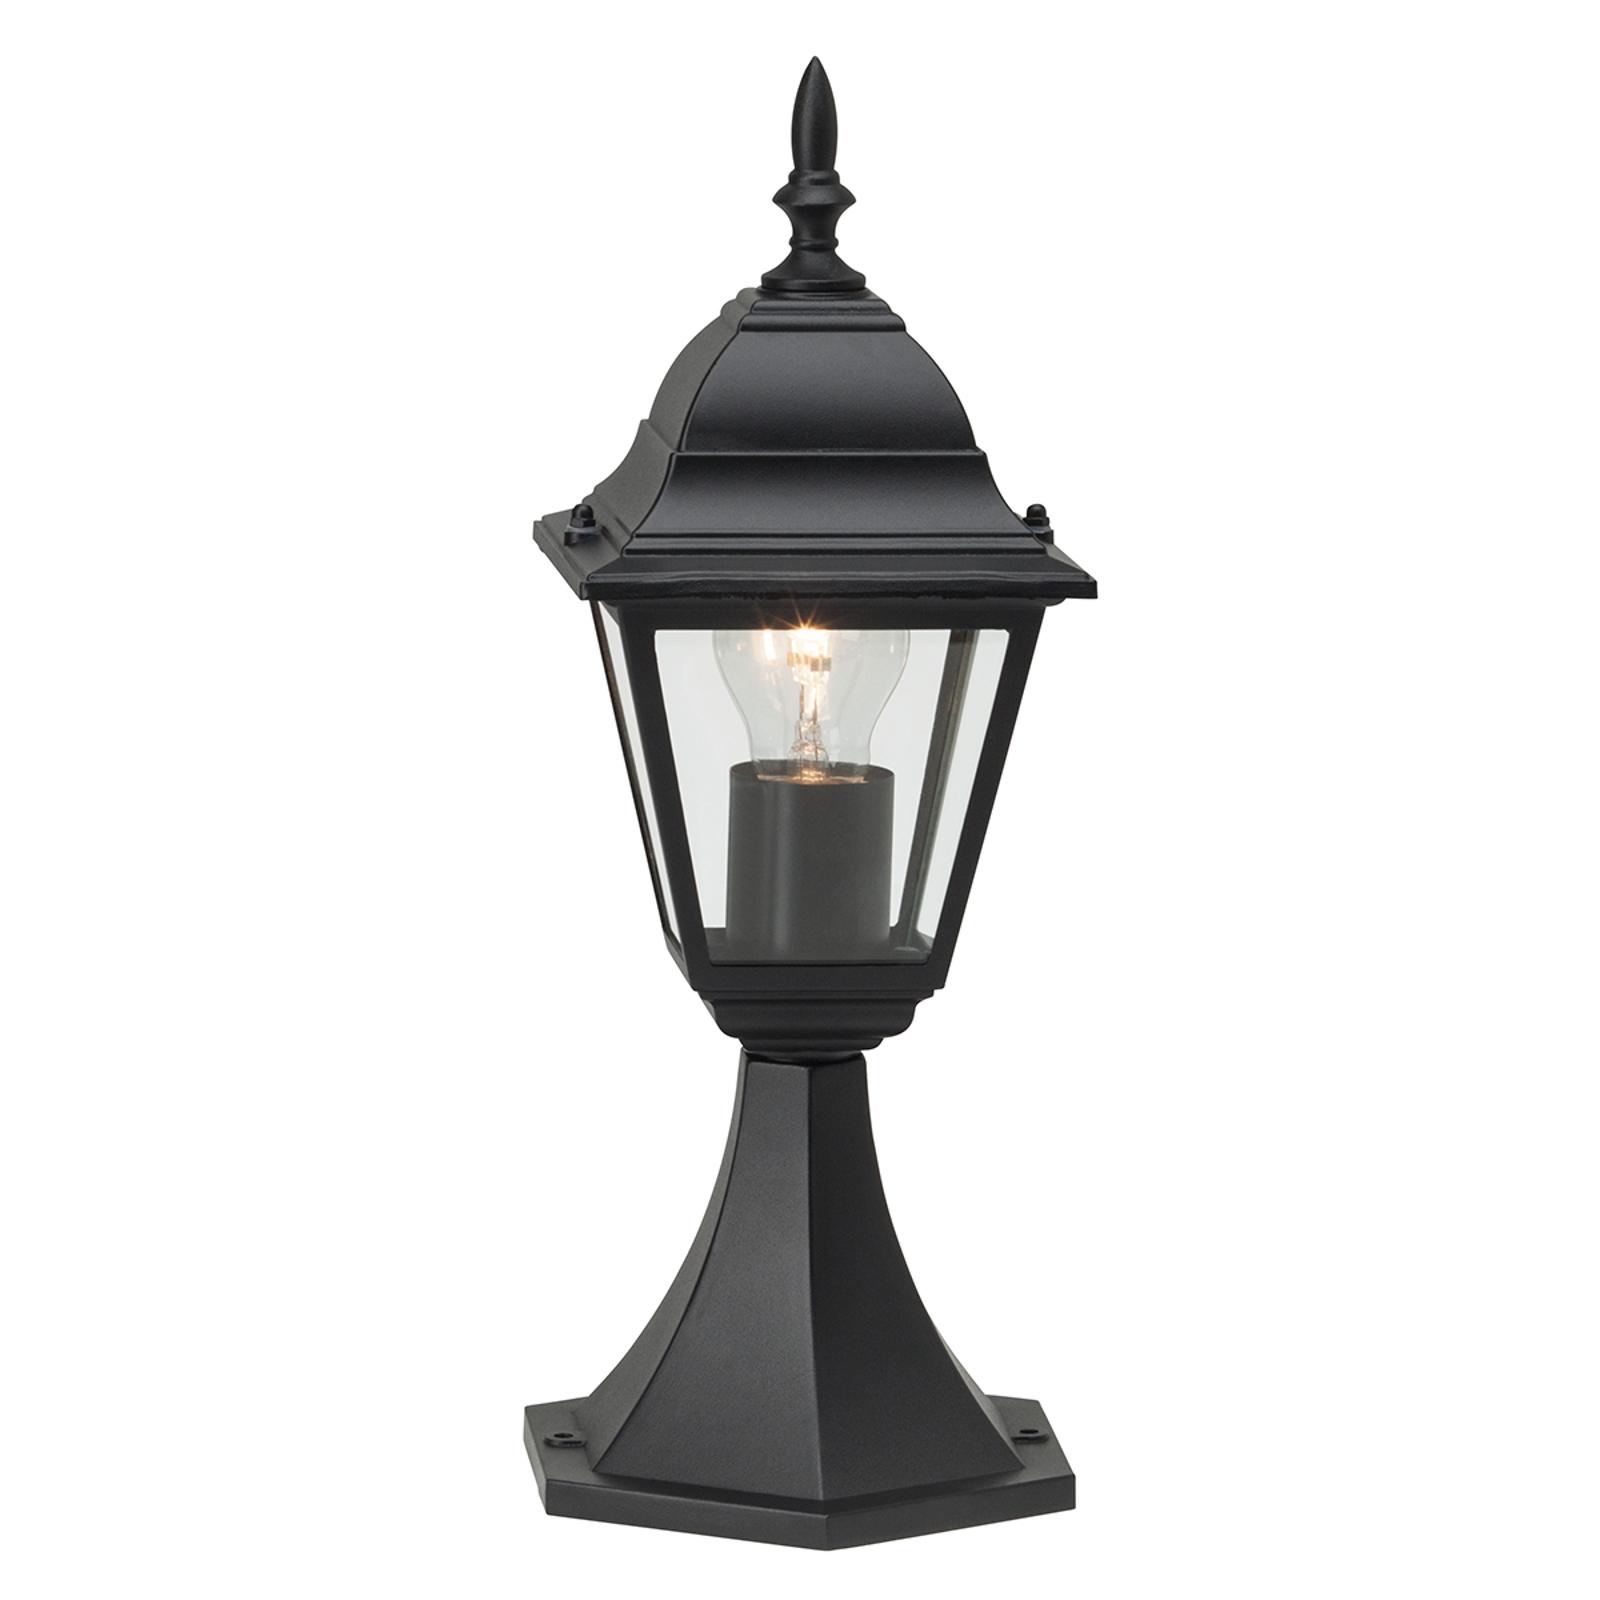 Pillar light Newport_1507091_1